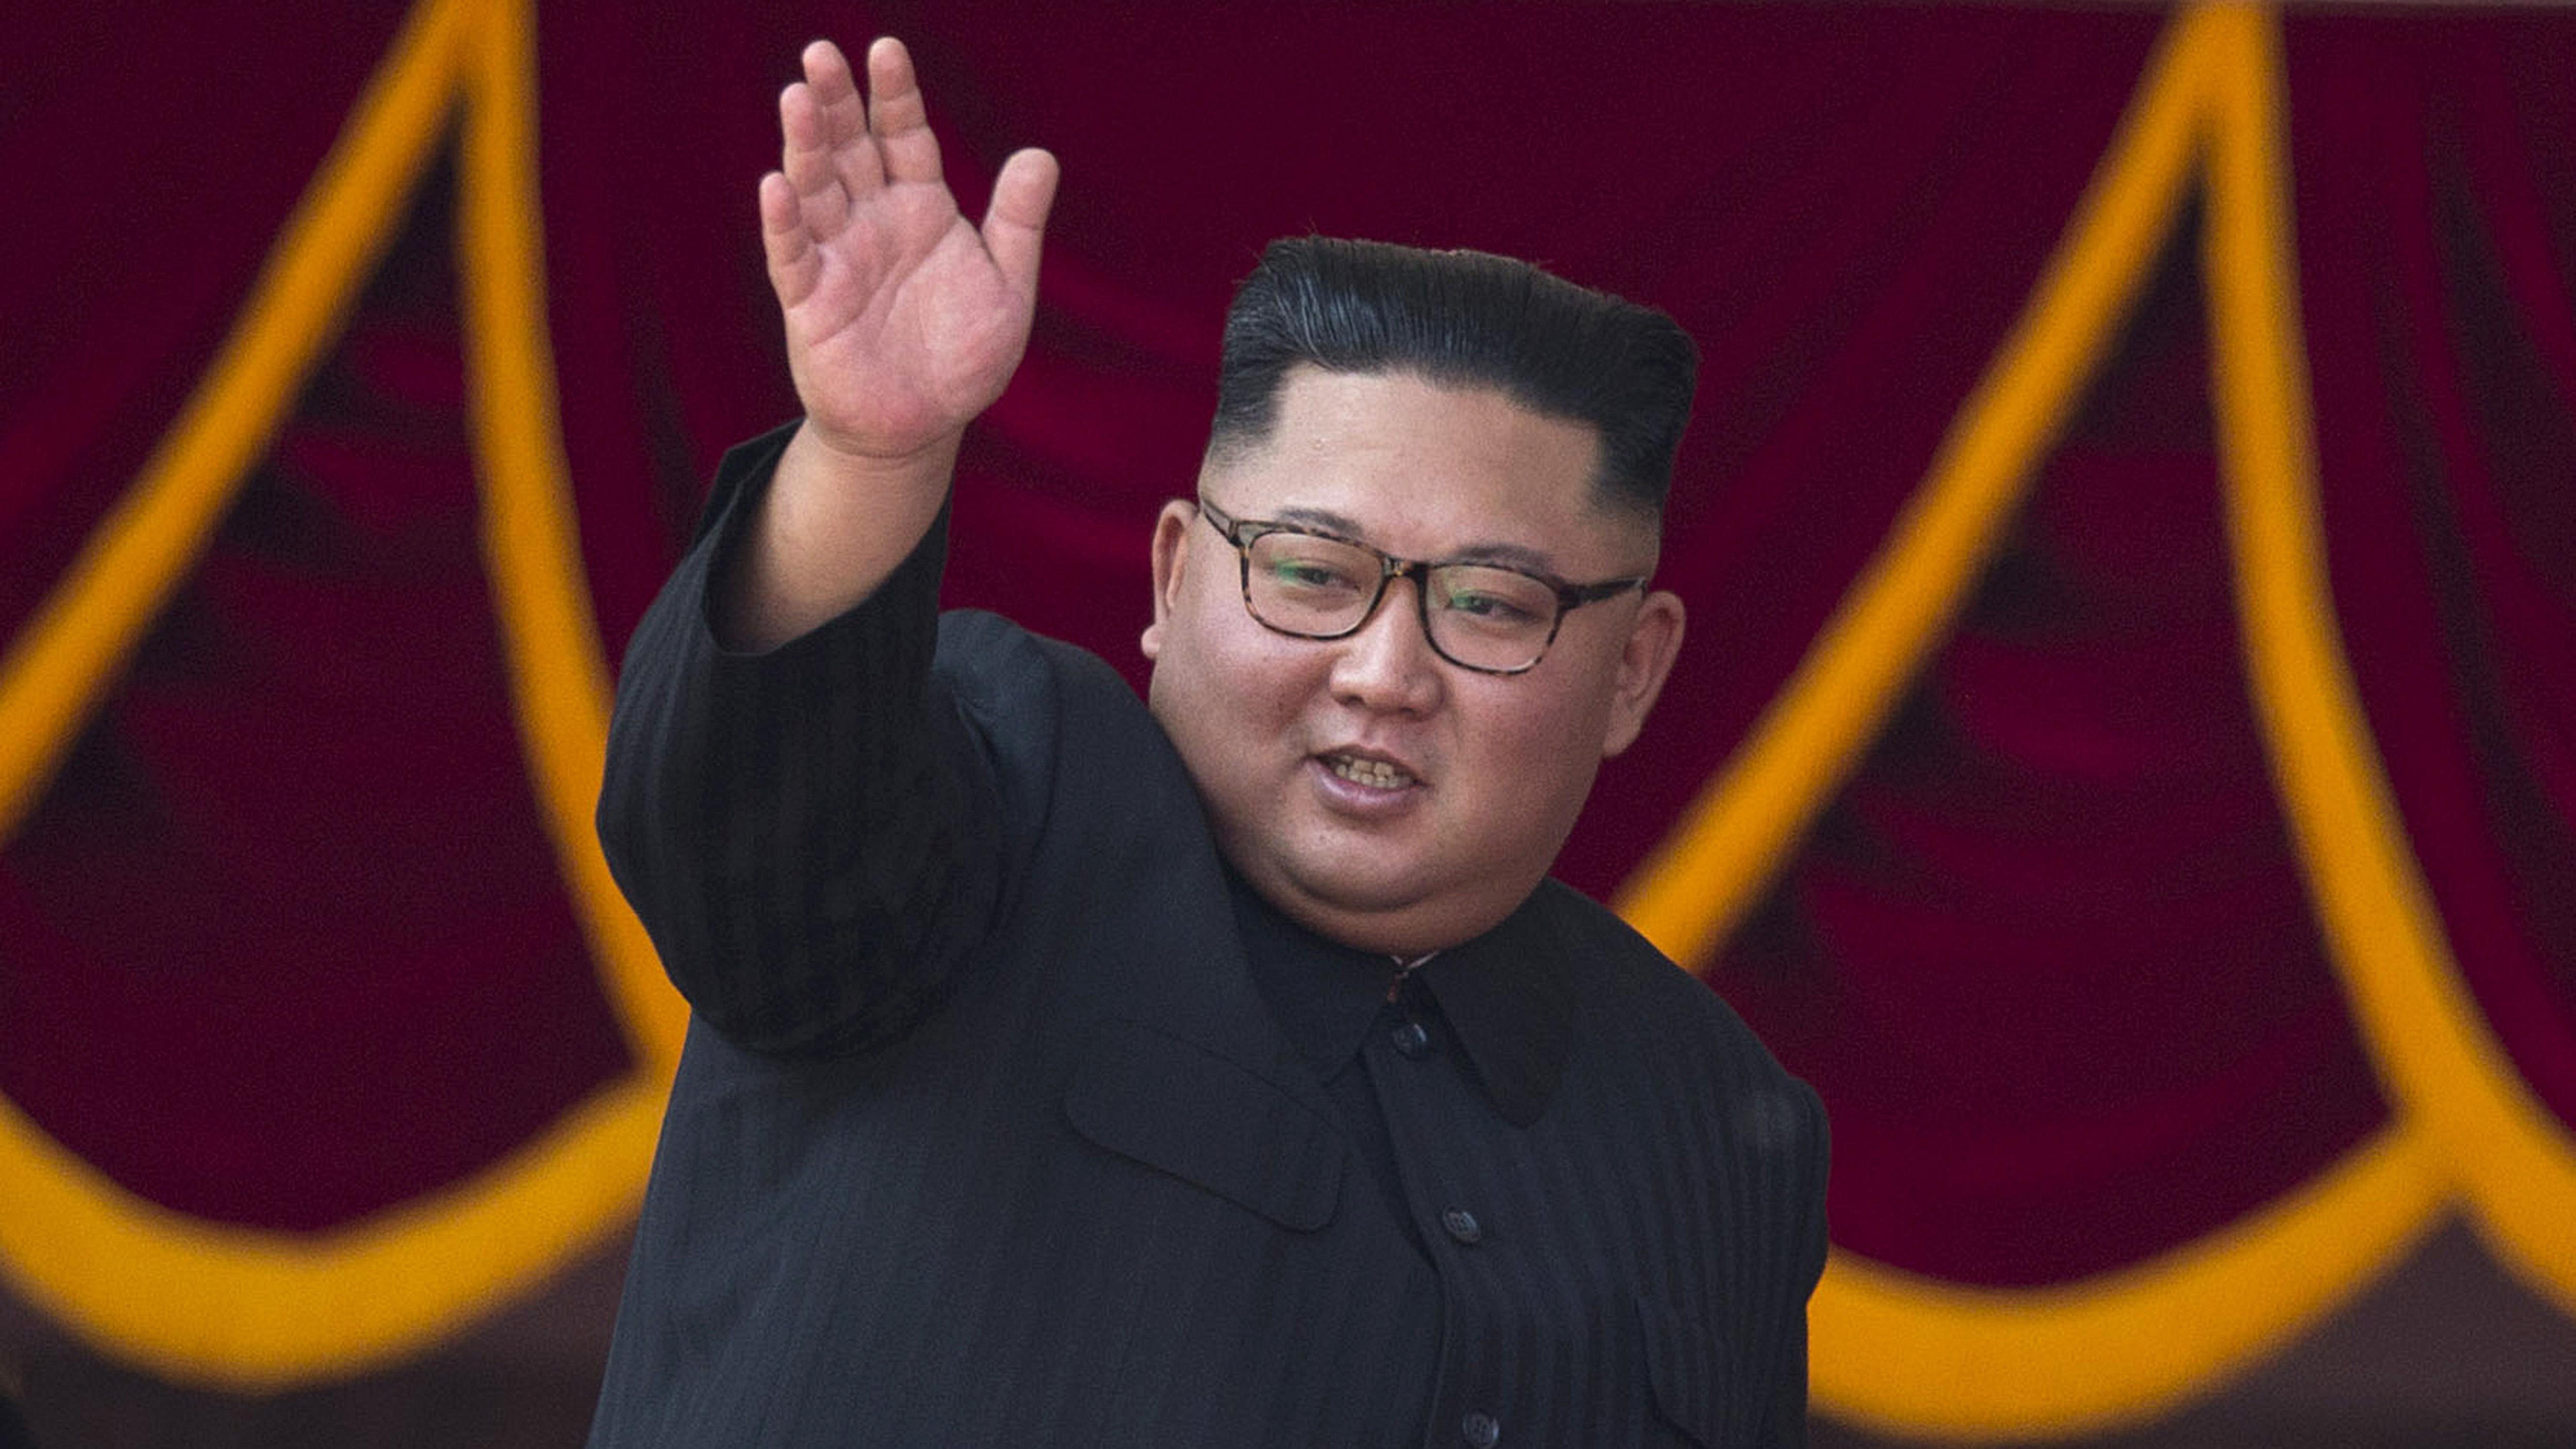 South Korean Company Sells Kim Jong Un Beauty Masks, Spurring Criticism